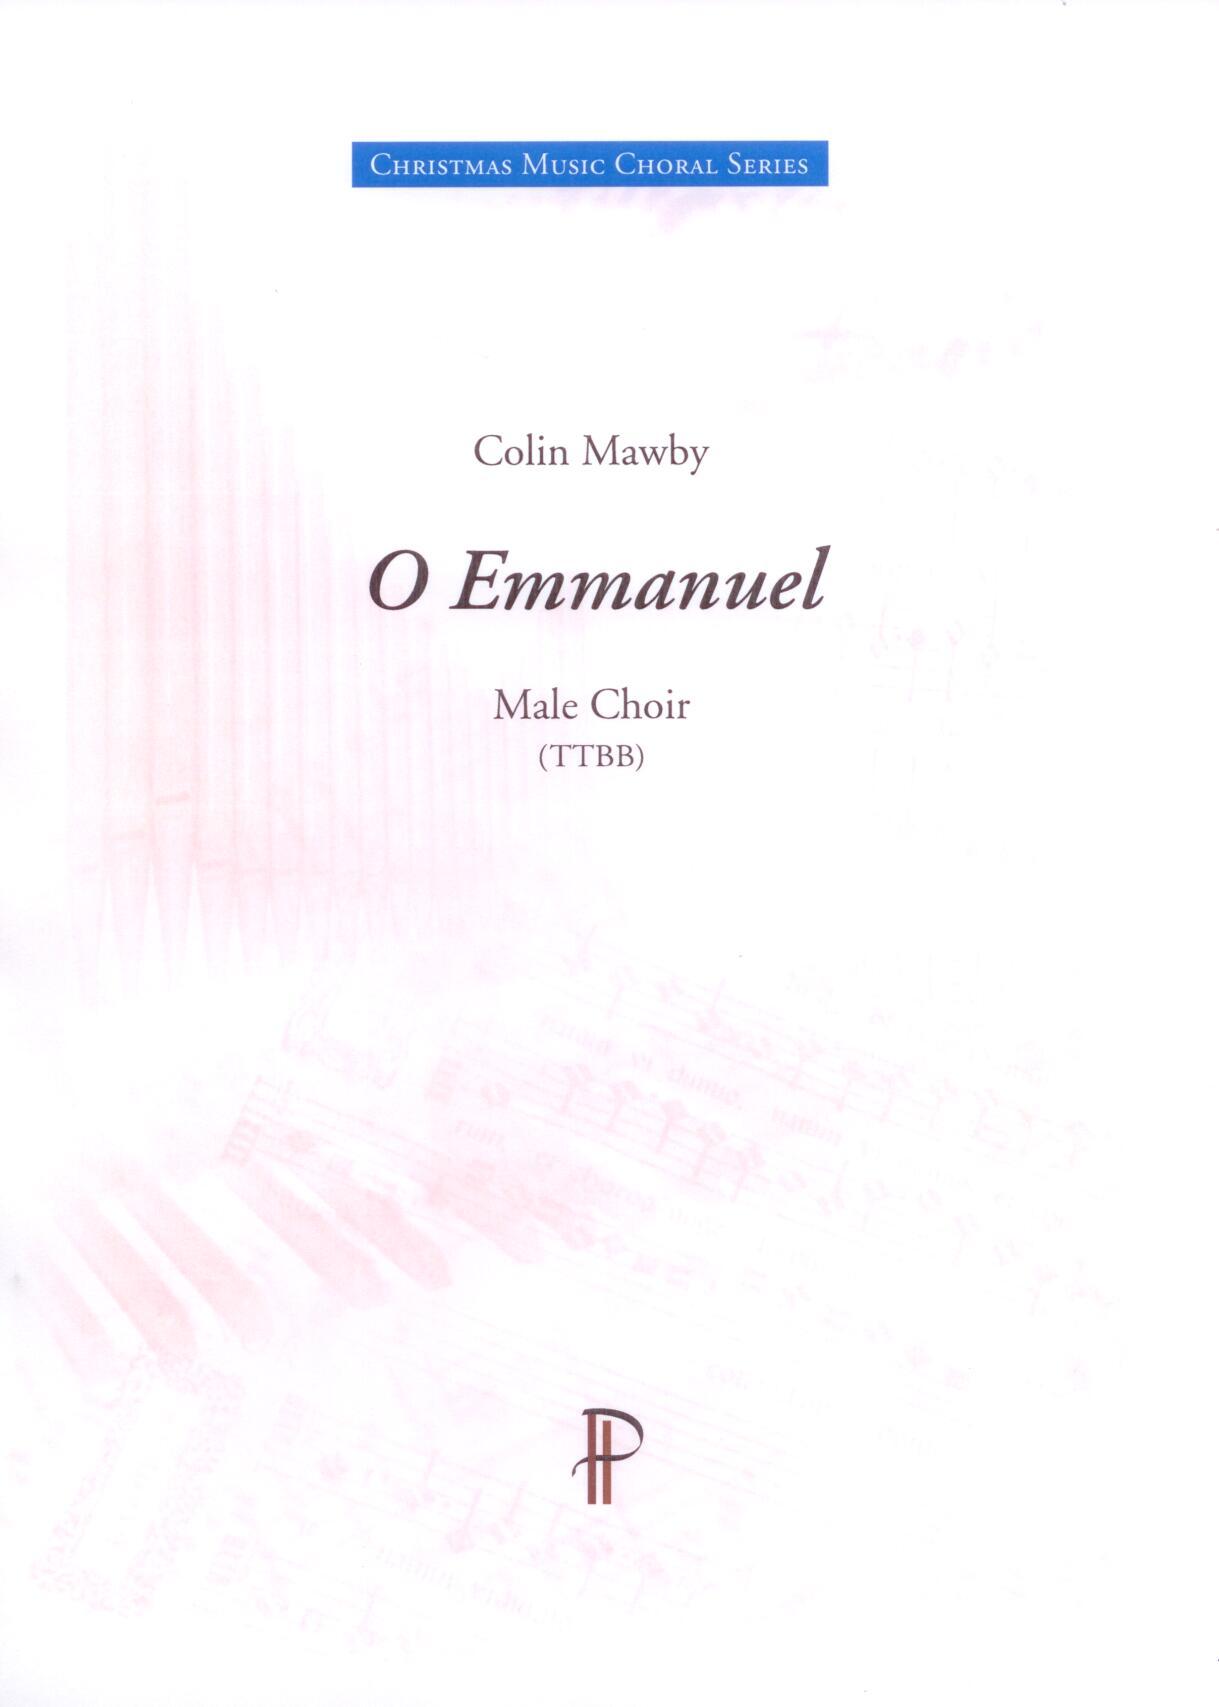 O Emmanuel, PH Publishers